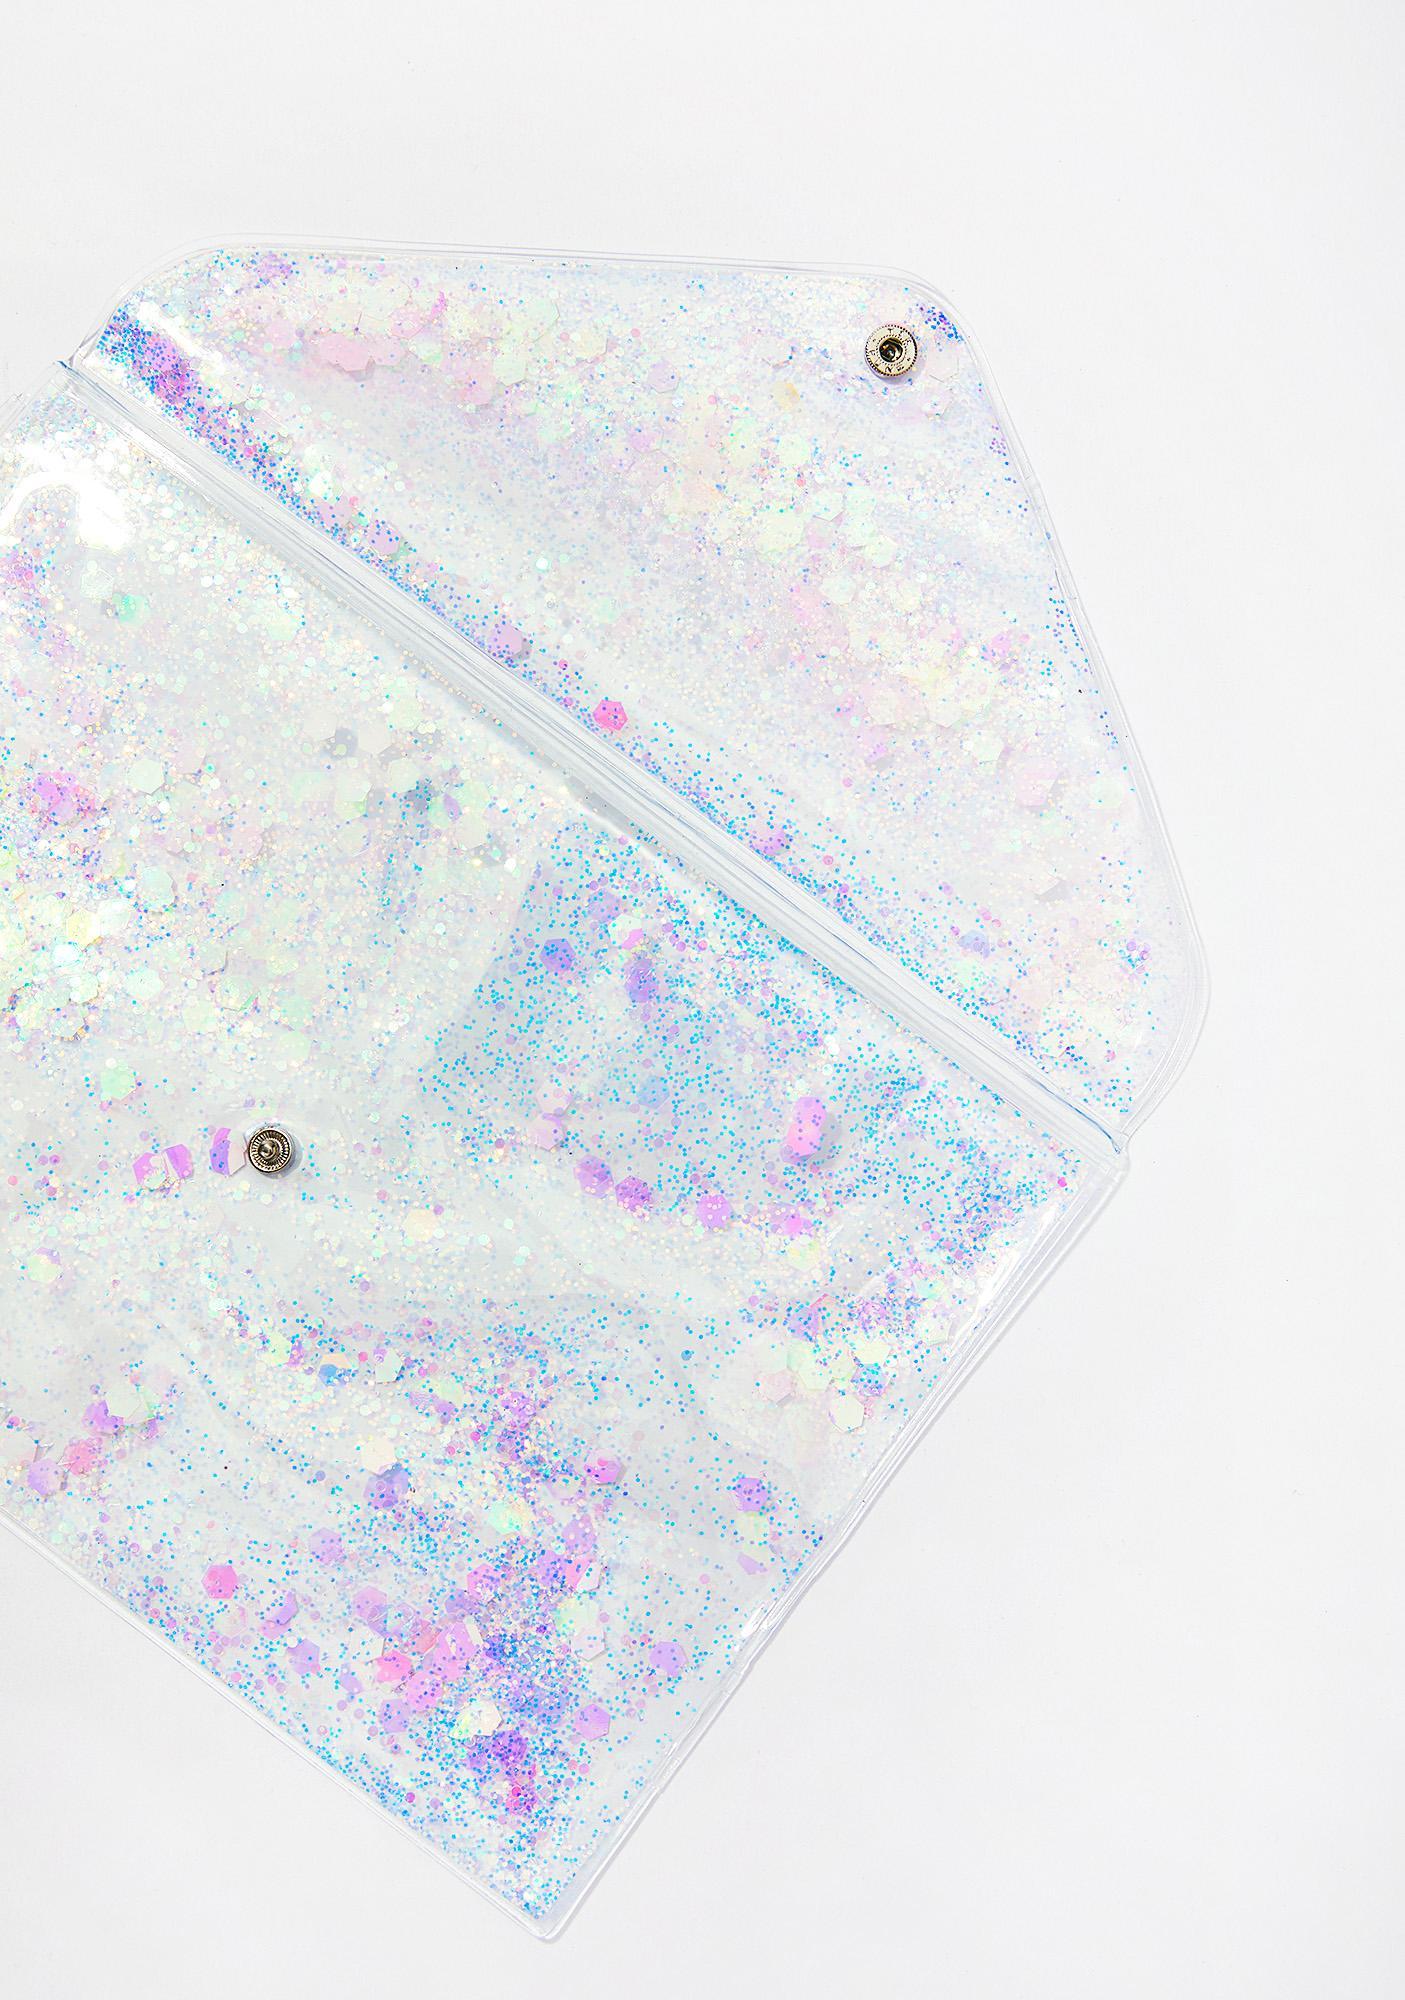 Skinnydip Sparkle Clutch